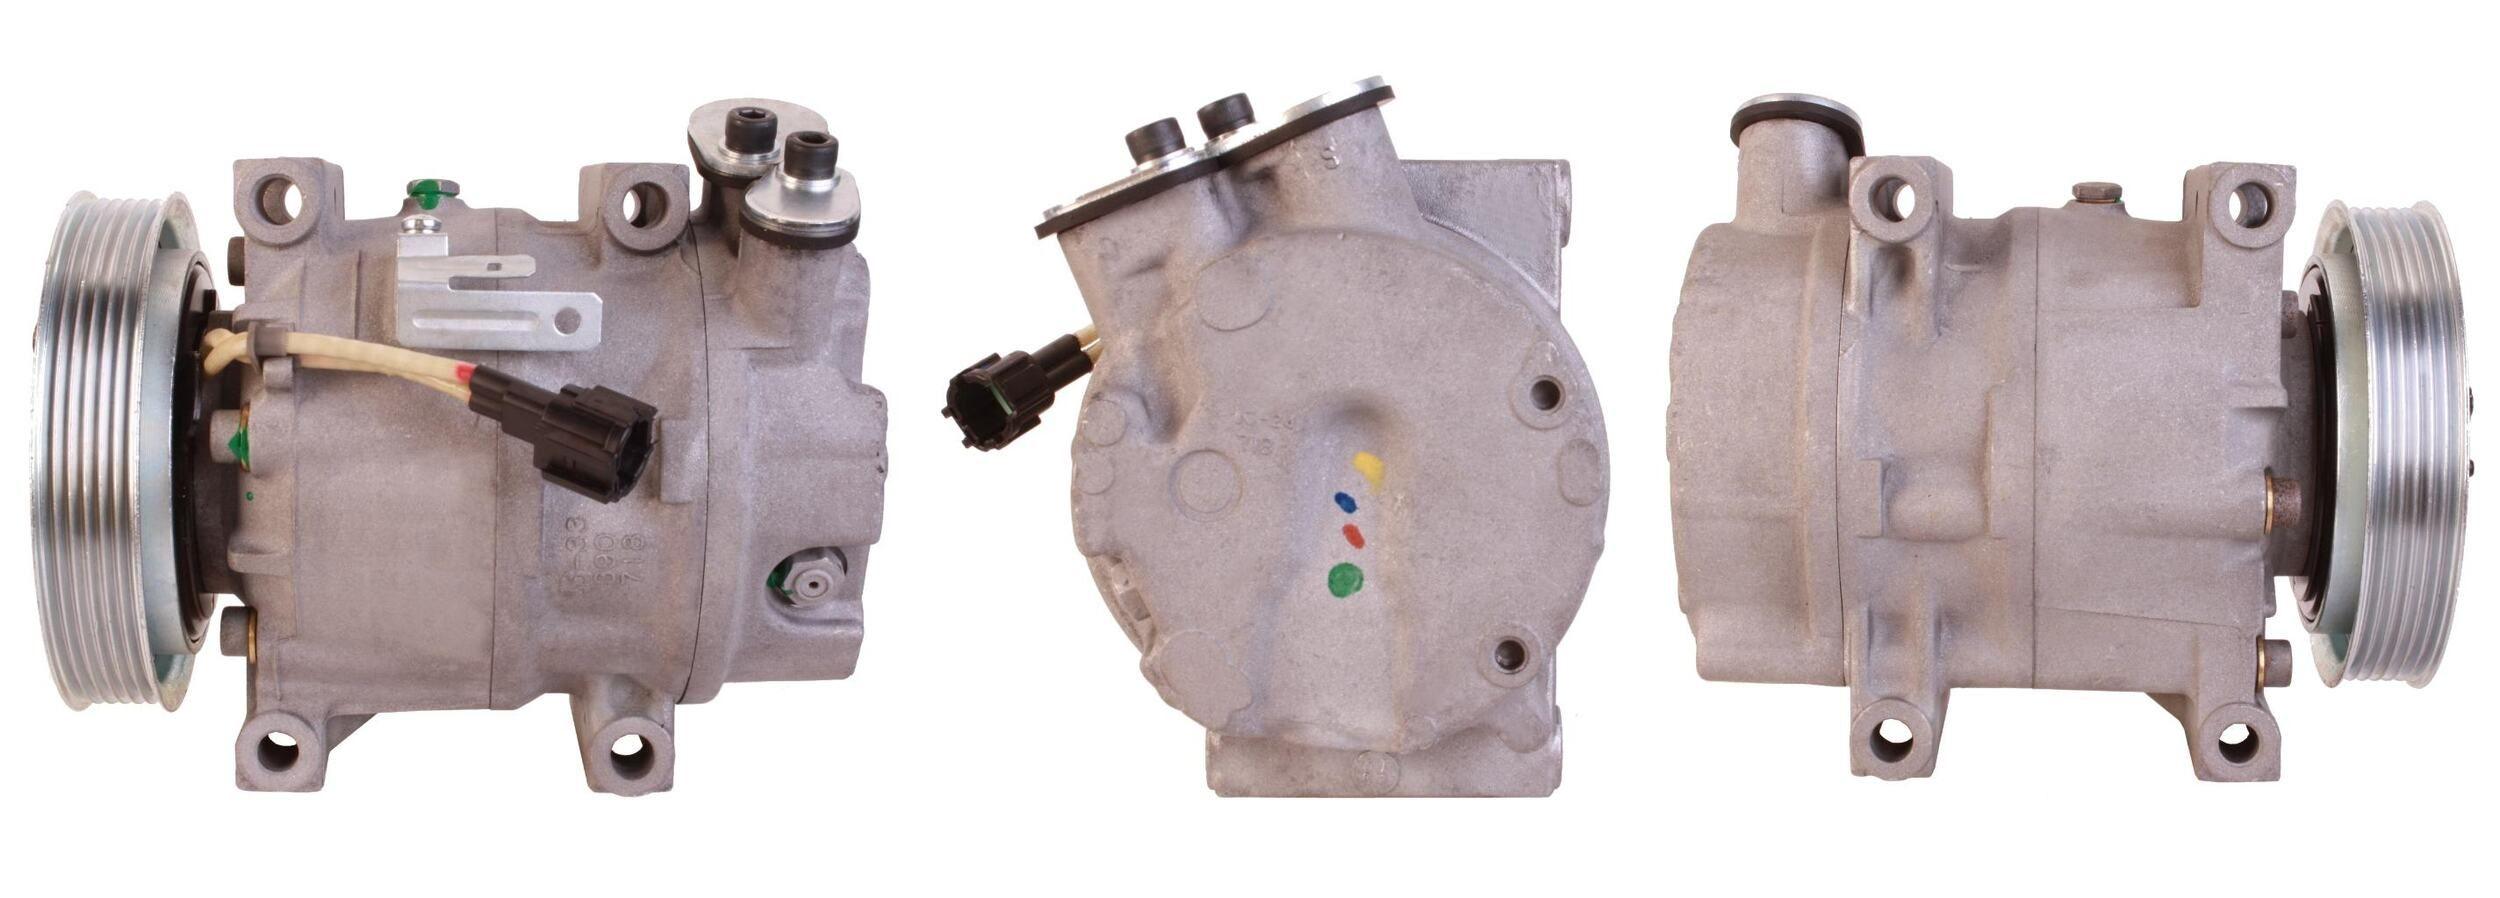 Original RENAULT Klimakompressor 51-0843